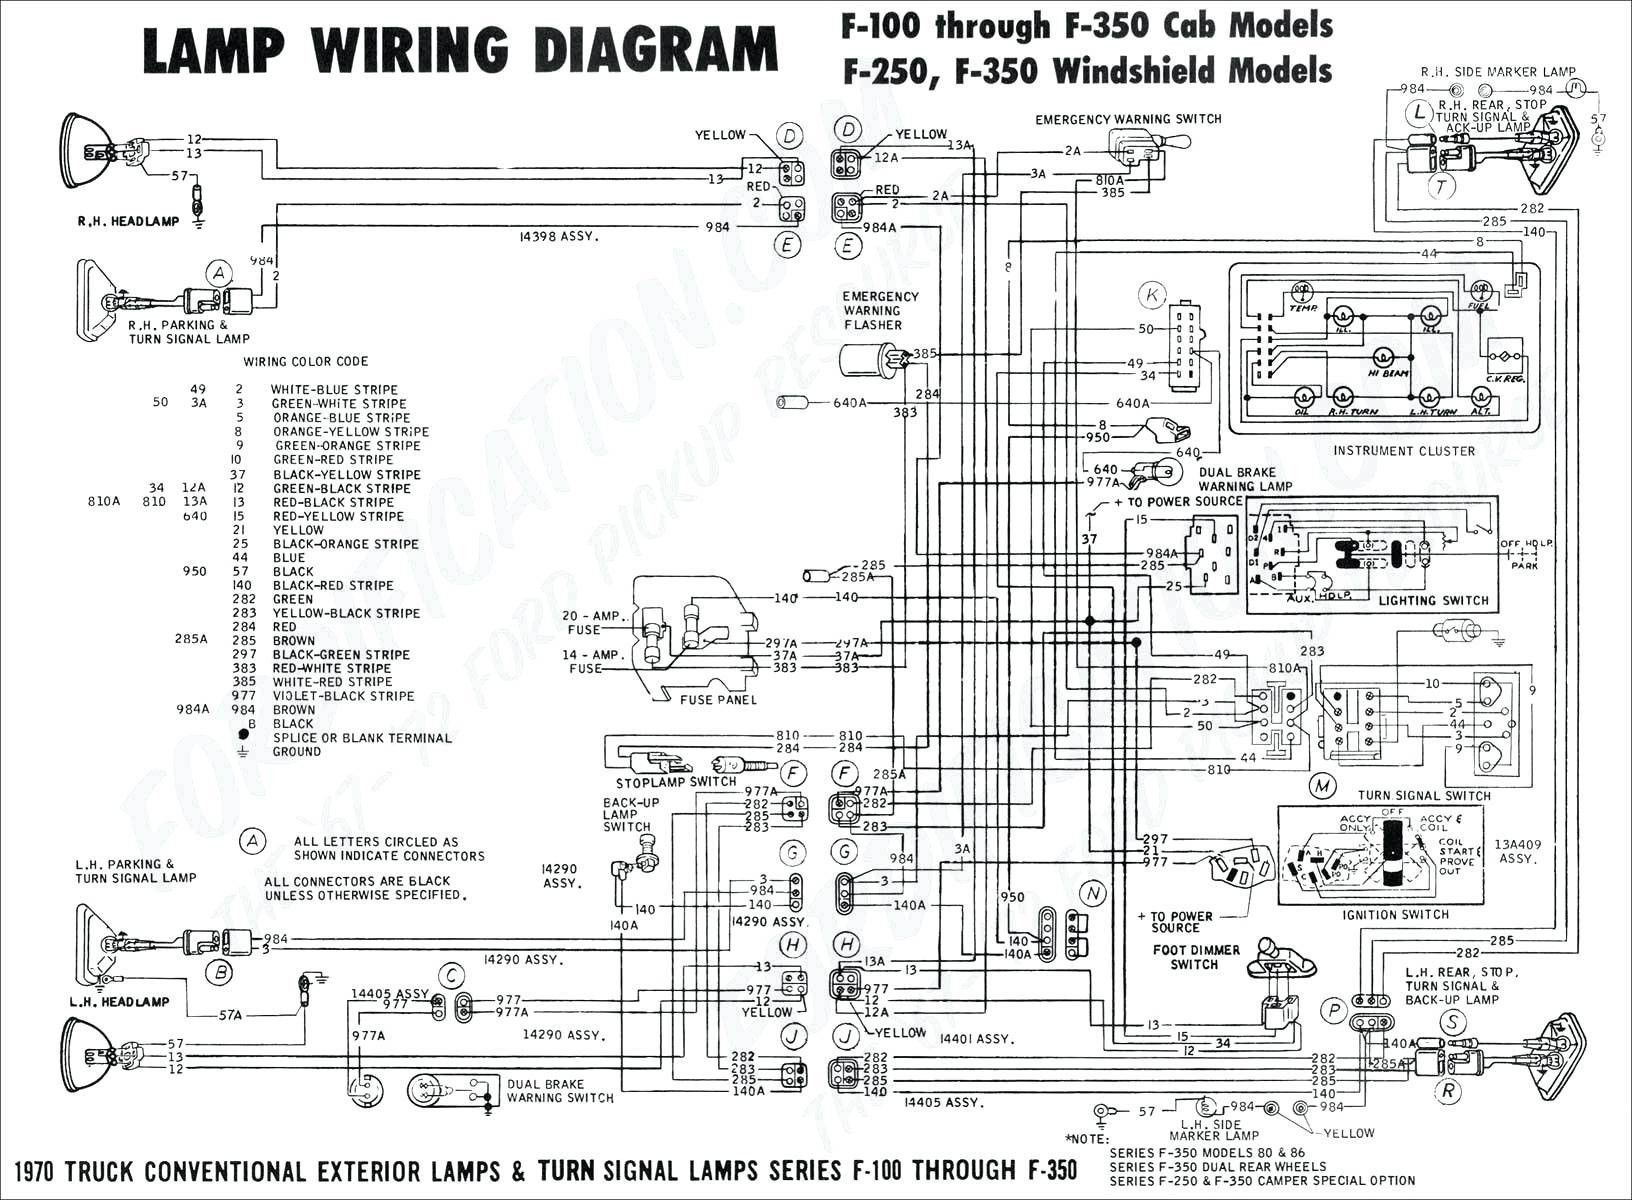 Residential Electrical Plan Symbols Inspirational In 2020 Trailer Wiring Diagram Electrical Wiring Diagram Circuit Diagram